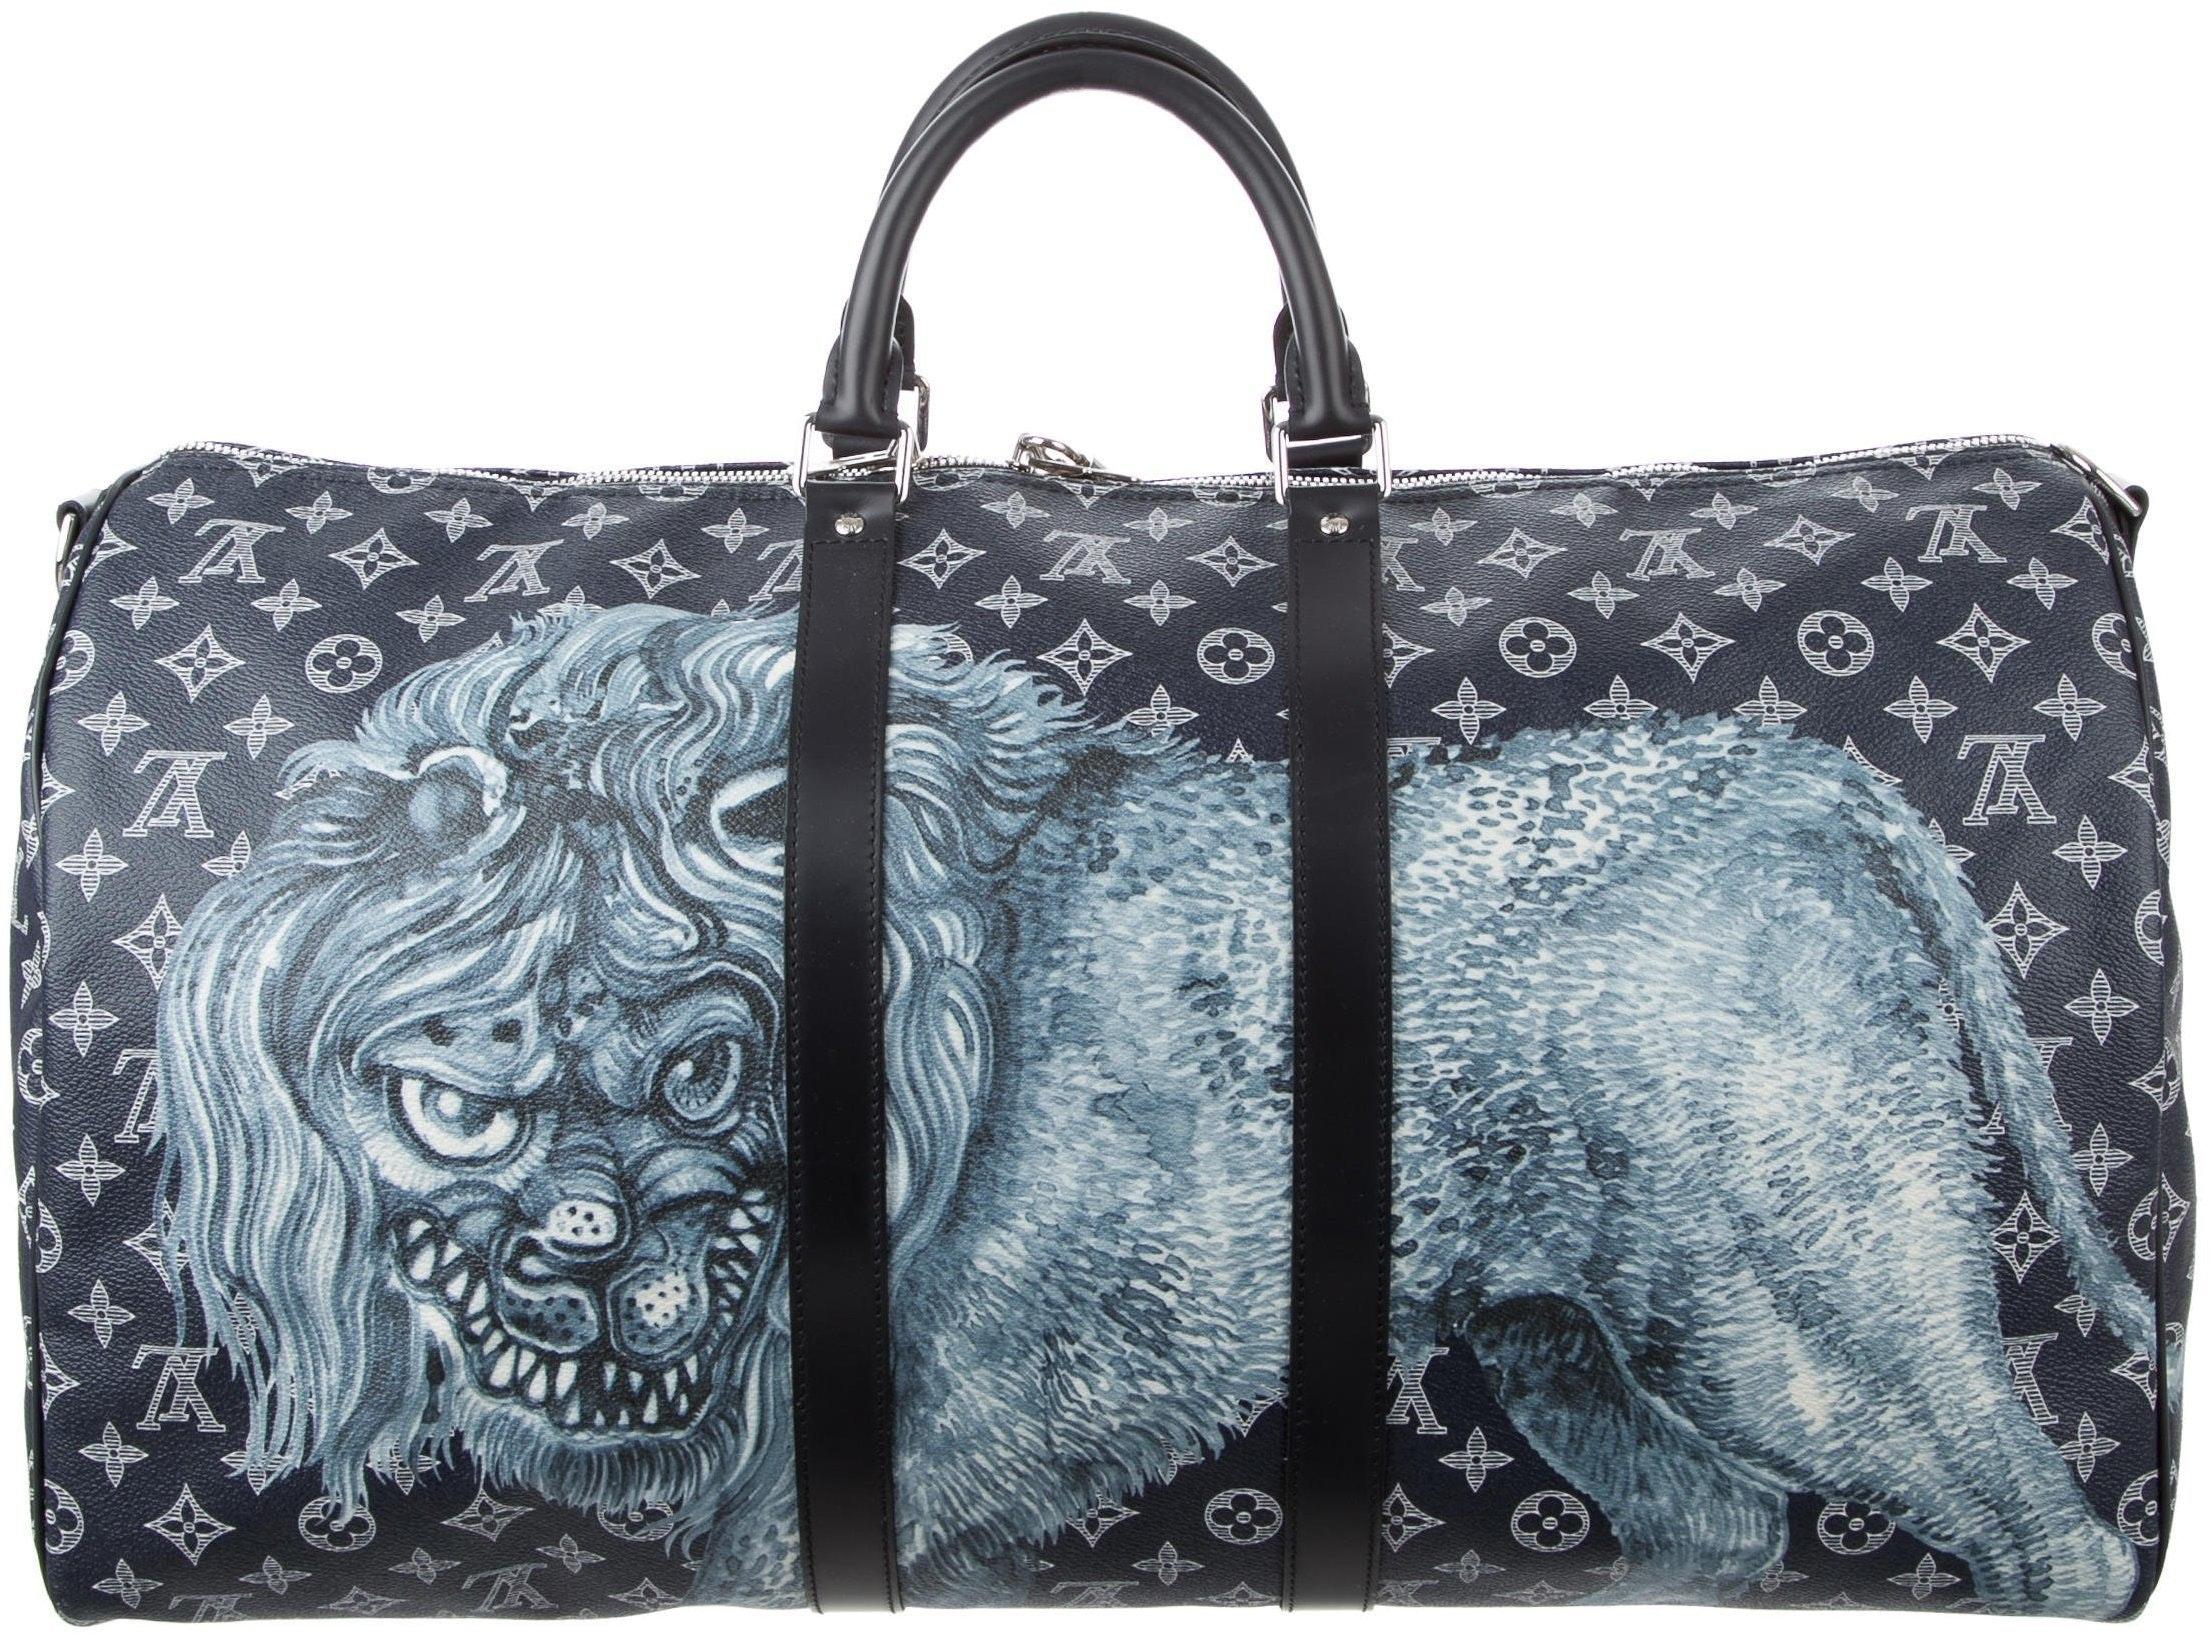 Louis Vuitton Duffle Keepall Bandouliere Savane Monogram Chapman Lion Motif 55 Midnight/ Multicolor